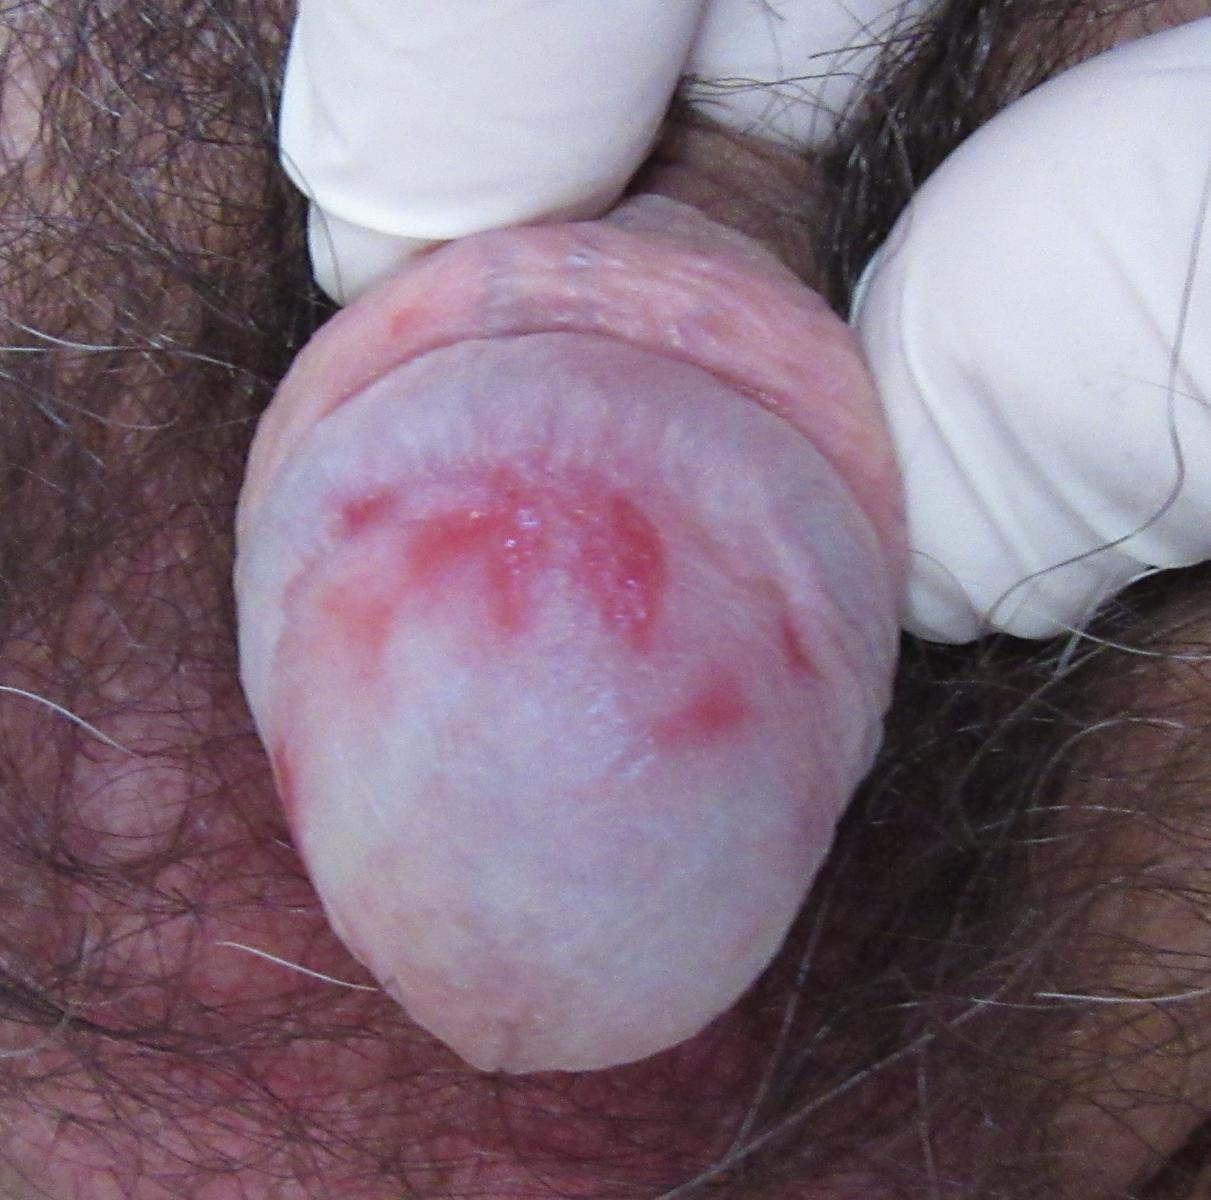 LSA - lichen sclerosus